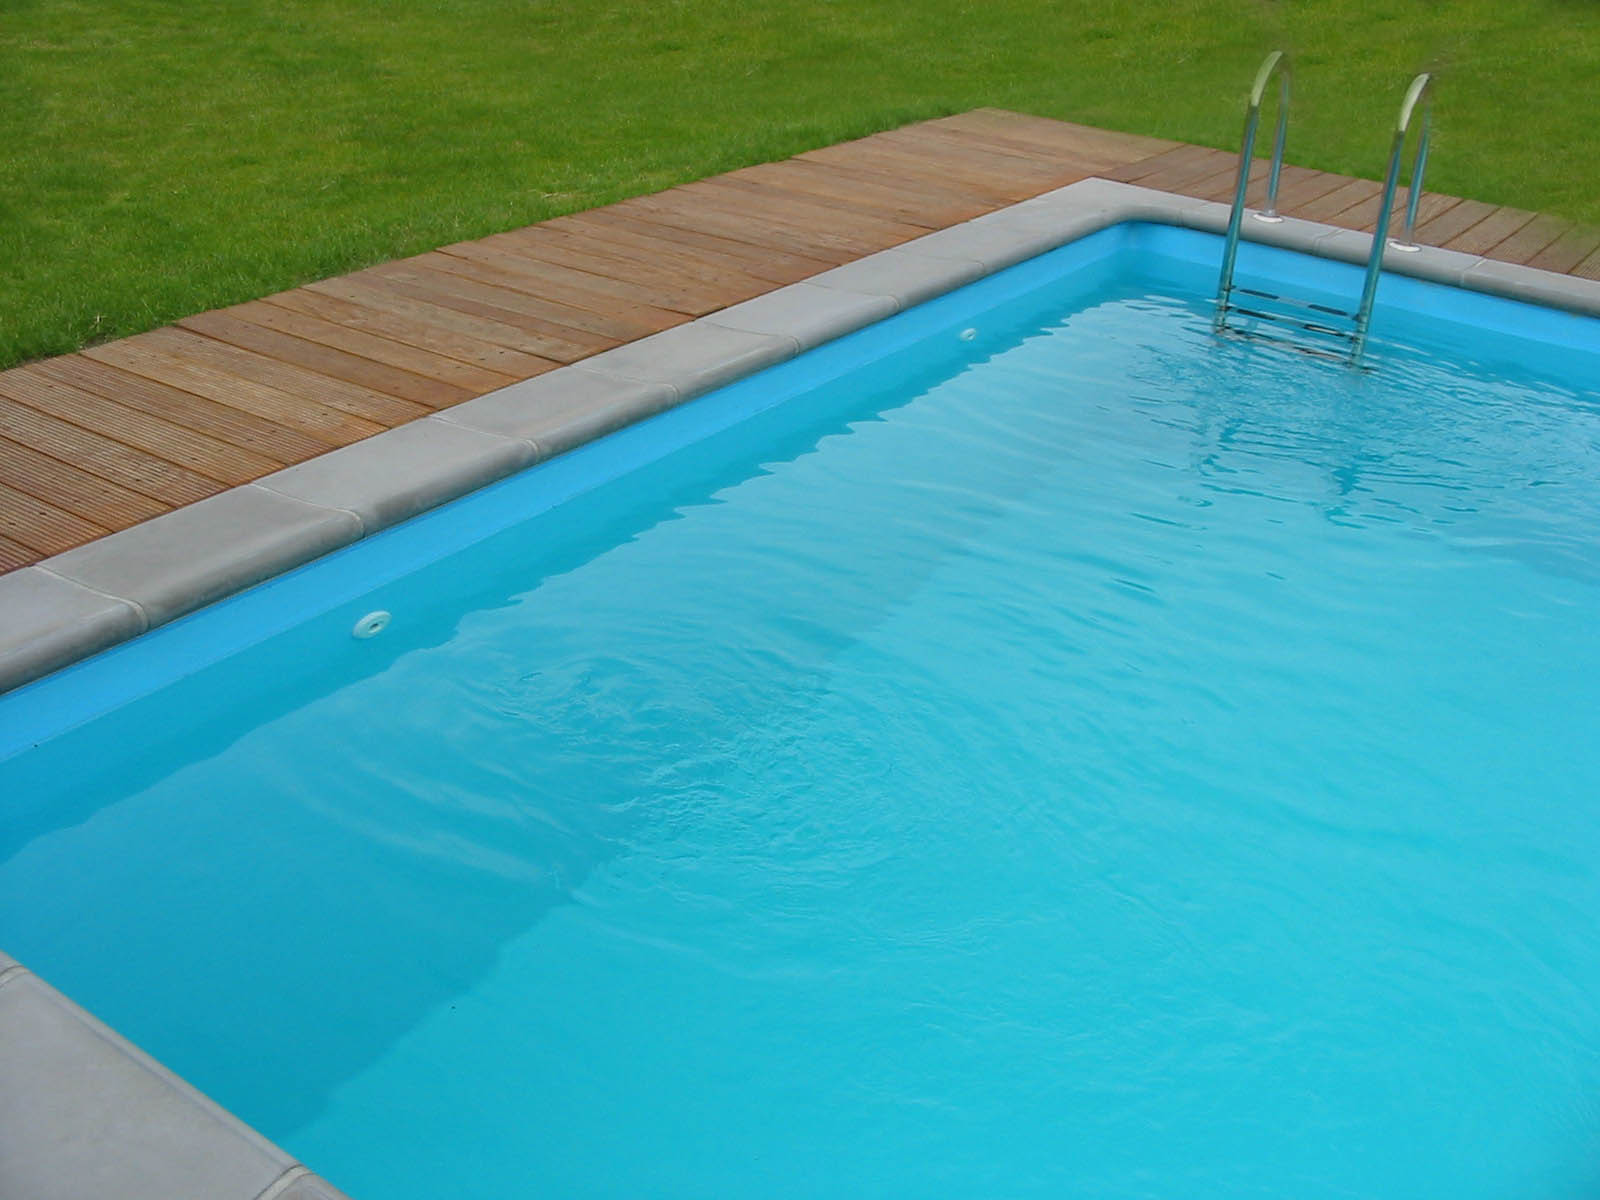 Piscines lempereur construction piscine r alisation for Realisation piscine